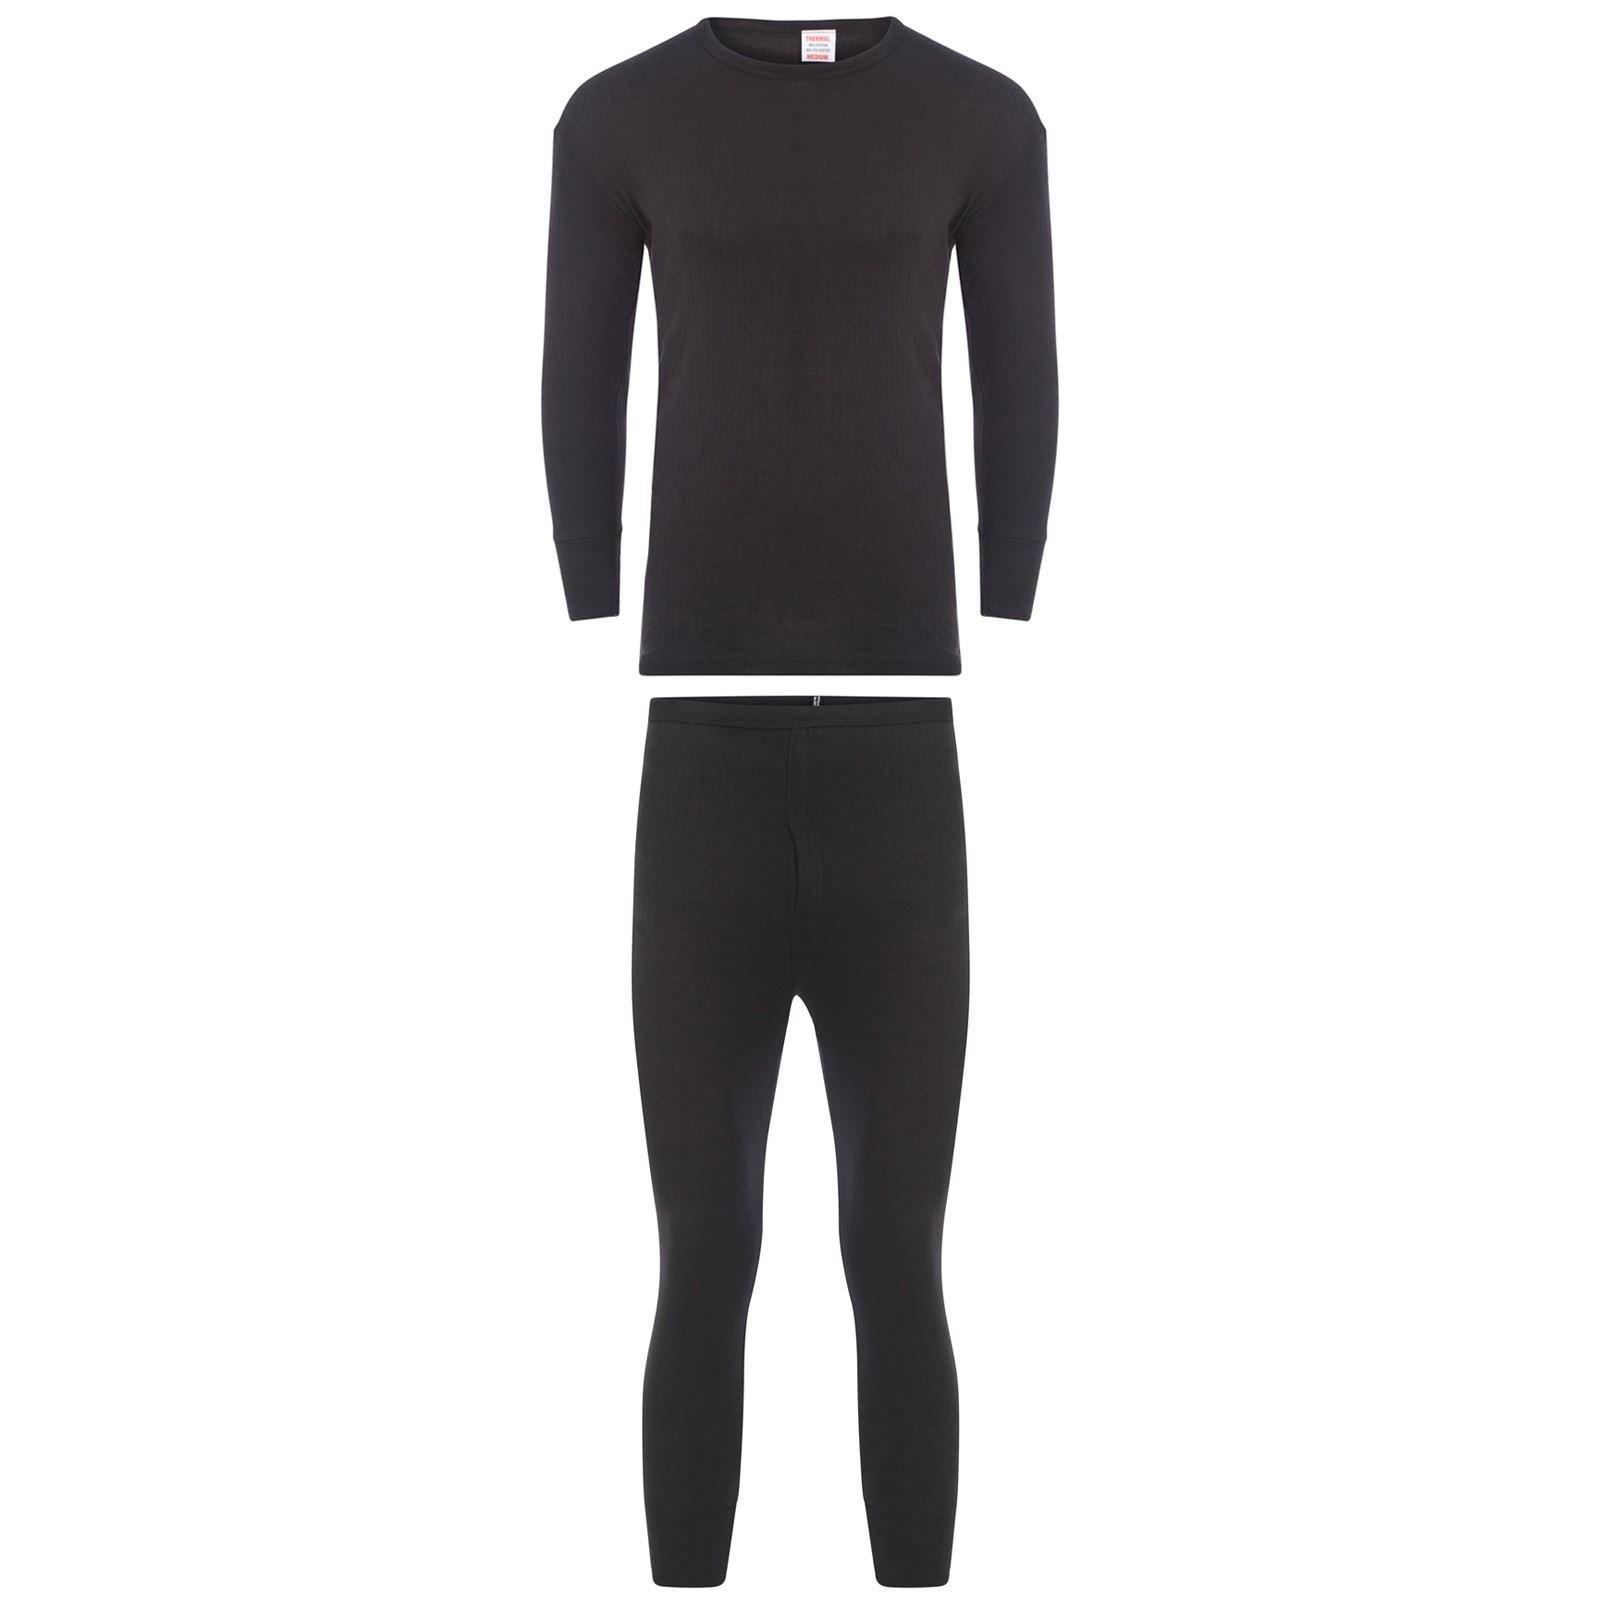 Minghe Boys Ski Thermal Underwear Set Long John Skin Base Layer Tops and Bottom Moisture Wicking,12,White